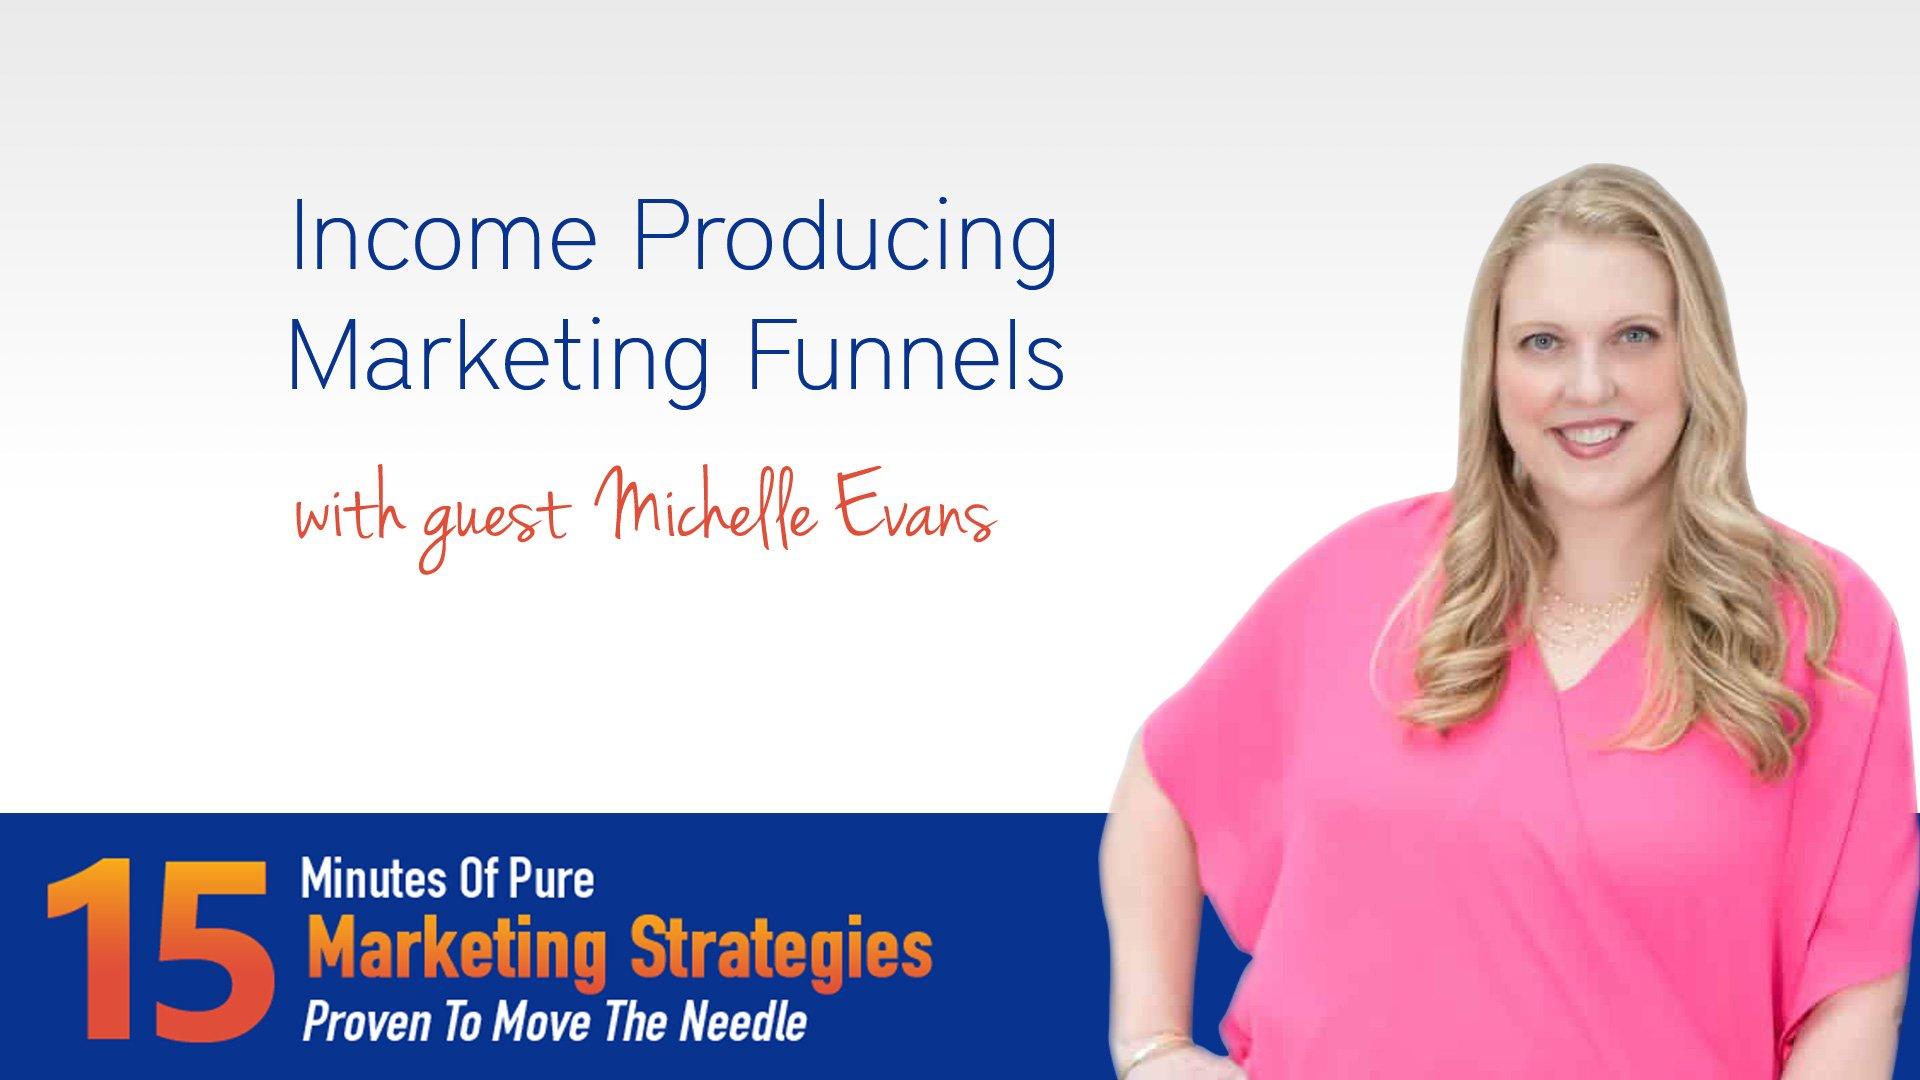 Marketing Funnels